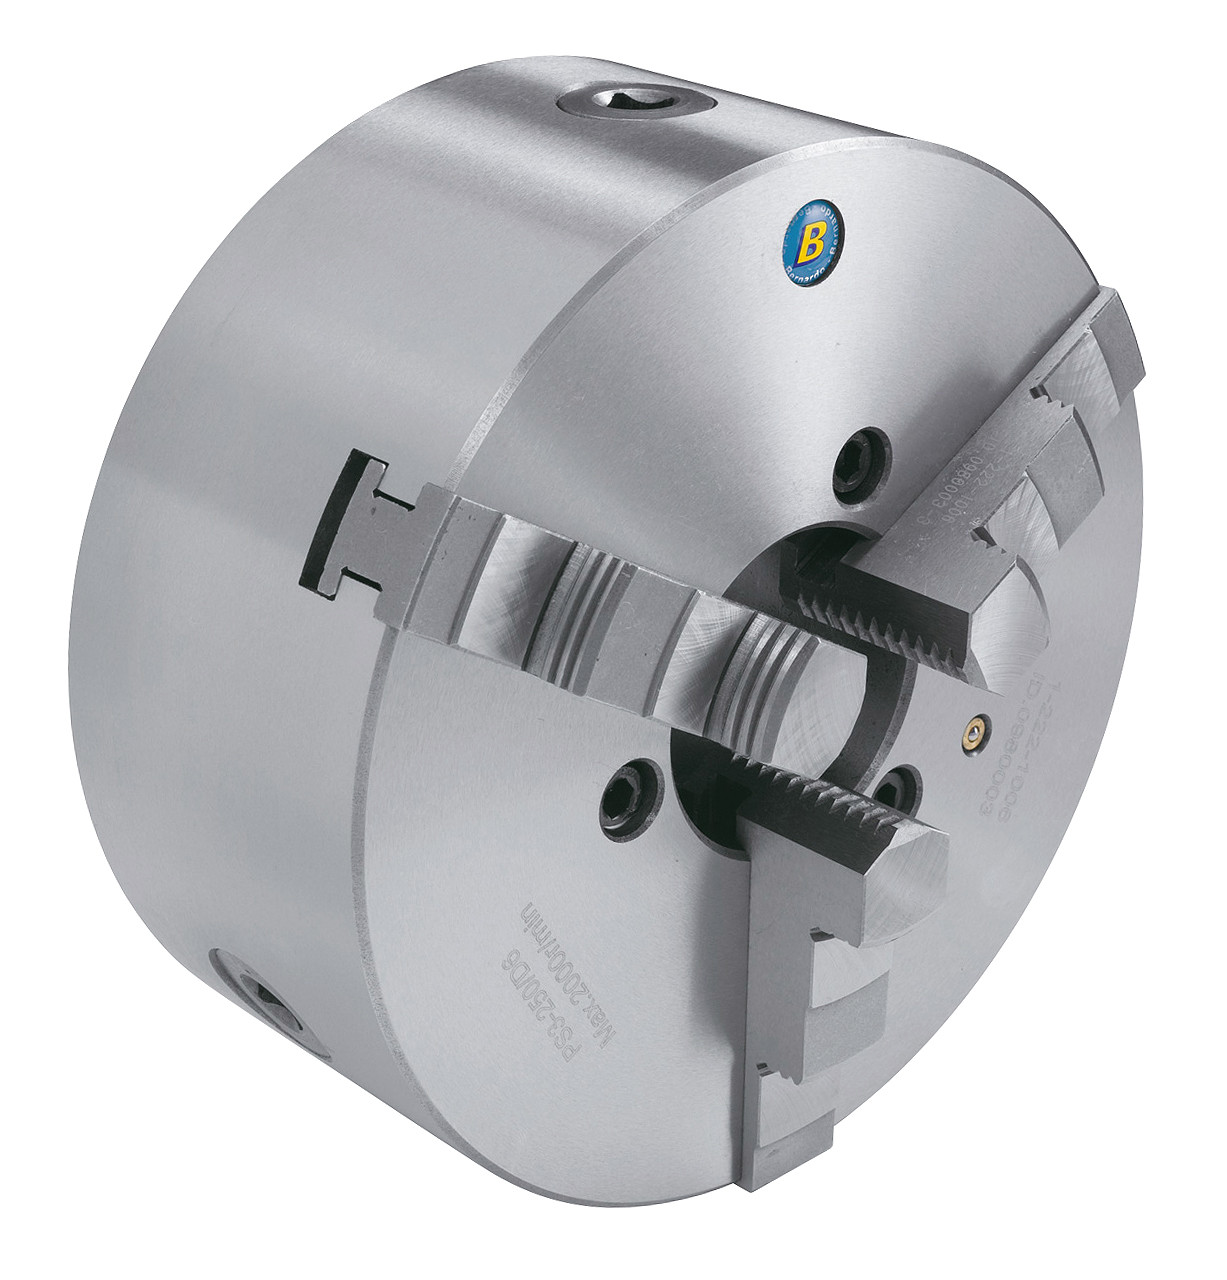 Стандартный 3-кулачковый патрон PS3-200/D6